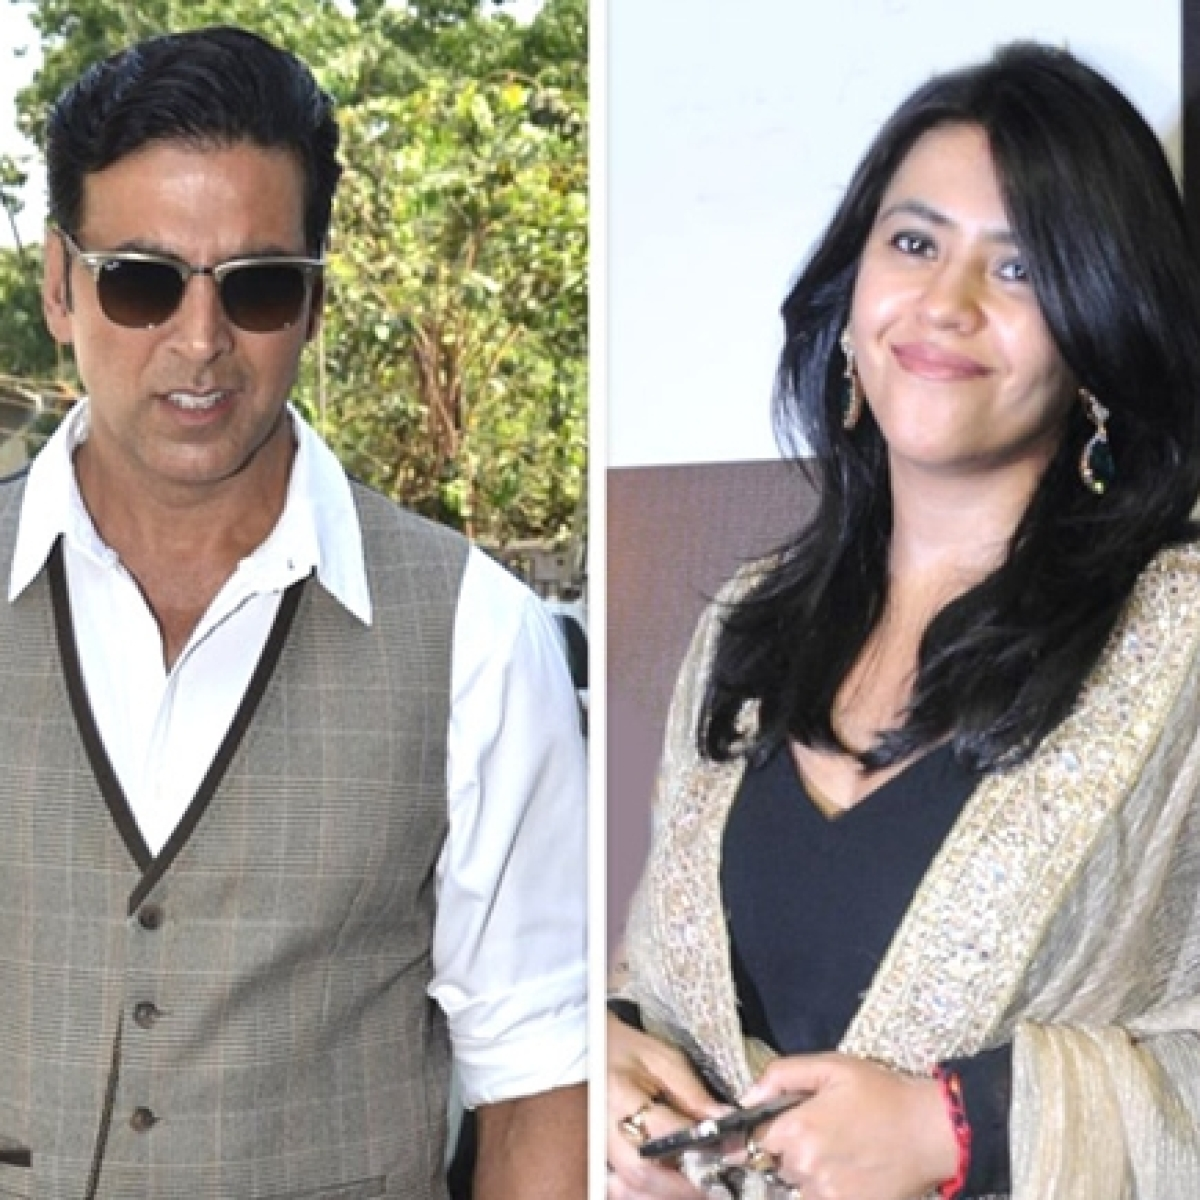 Akshay Kumar to reunite with Ekta Kapoor for an action comedy